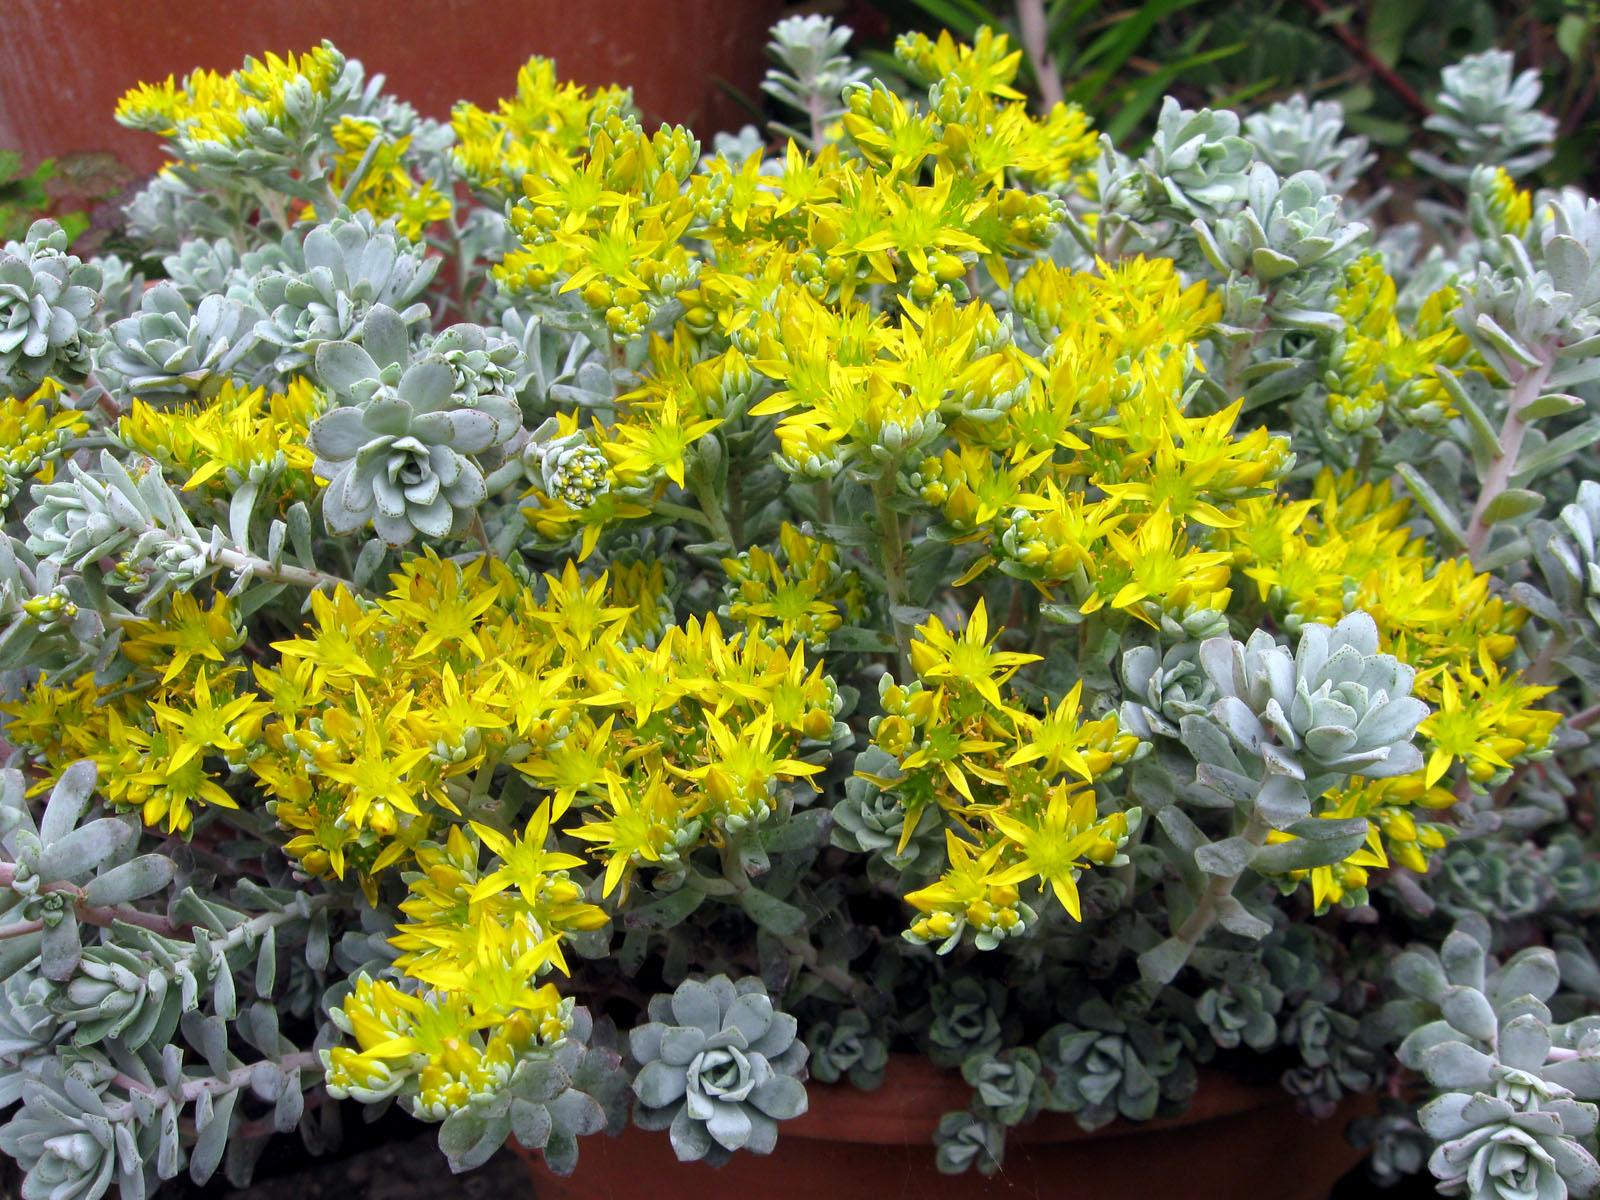 Drystonegarden 187 Blog Archive 187 Sedum Spathulifolium